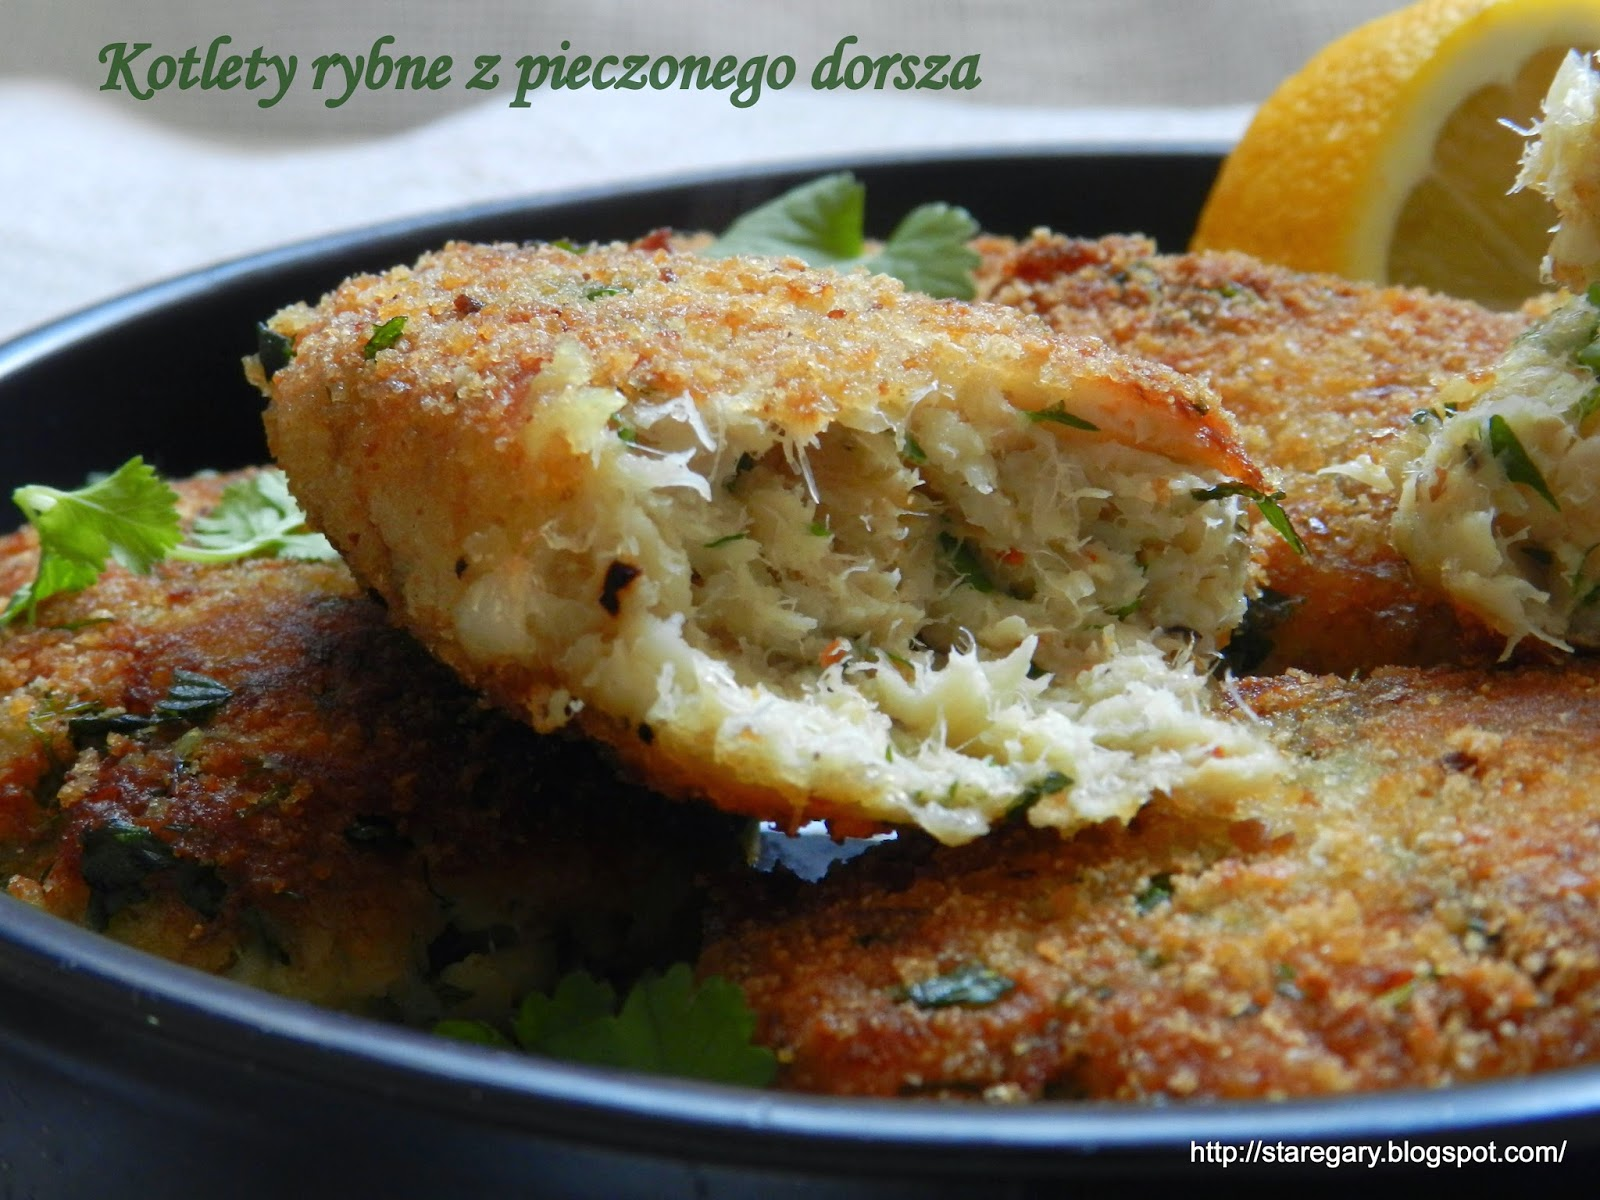 Kotlety rybne z pieczonego dorsza